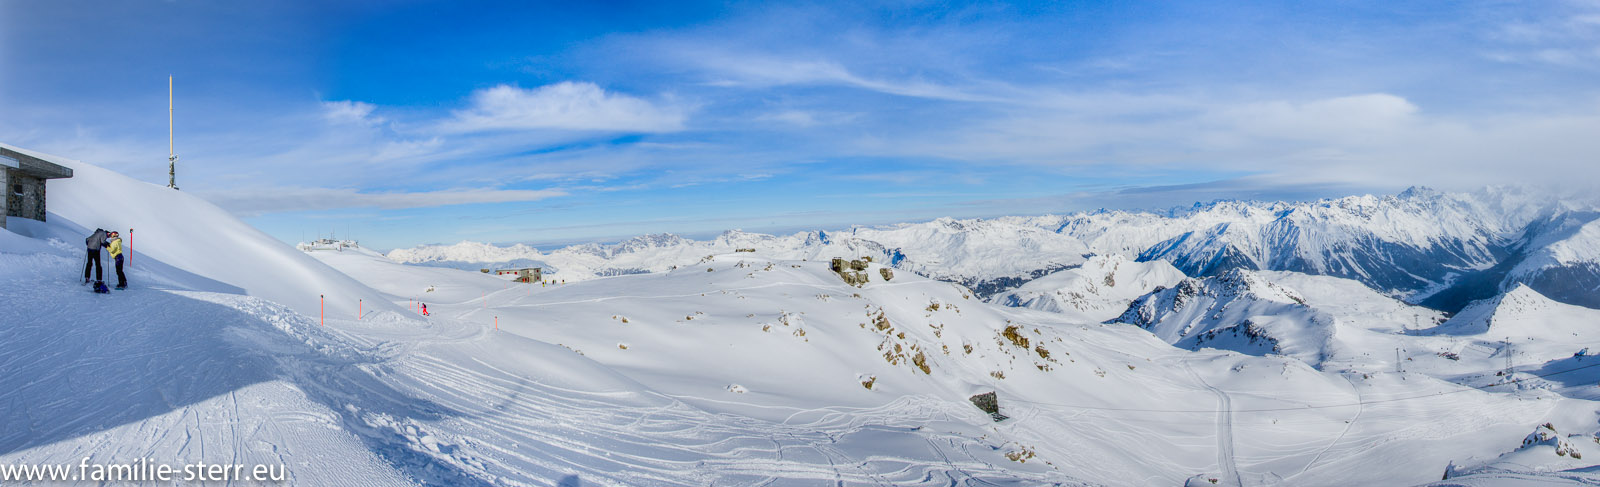 Weissfluh - Gipfel - Panorama NordWest - Nord - NordOst